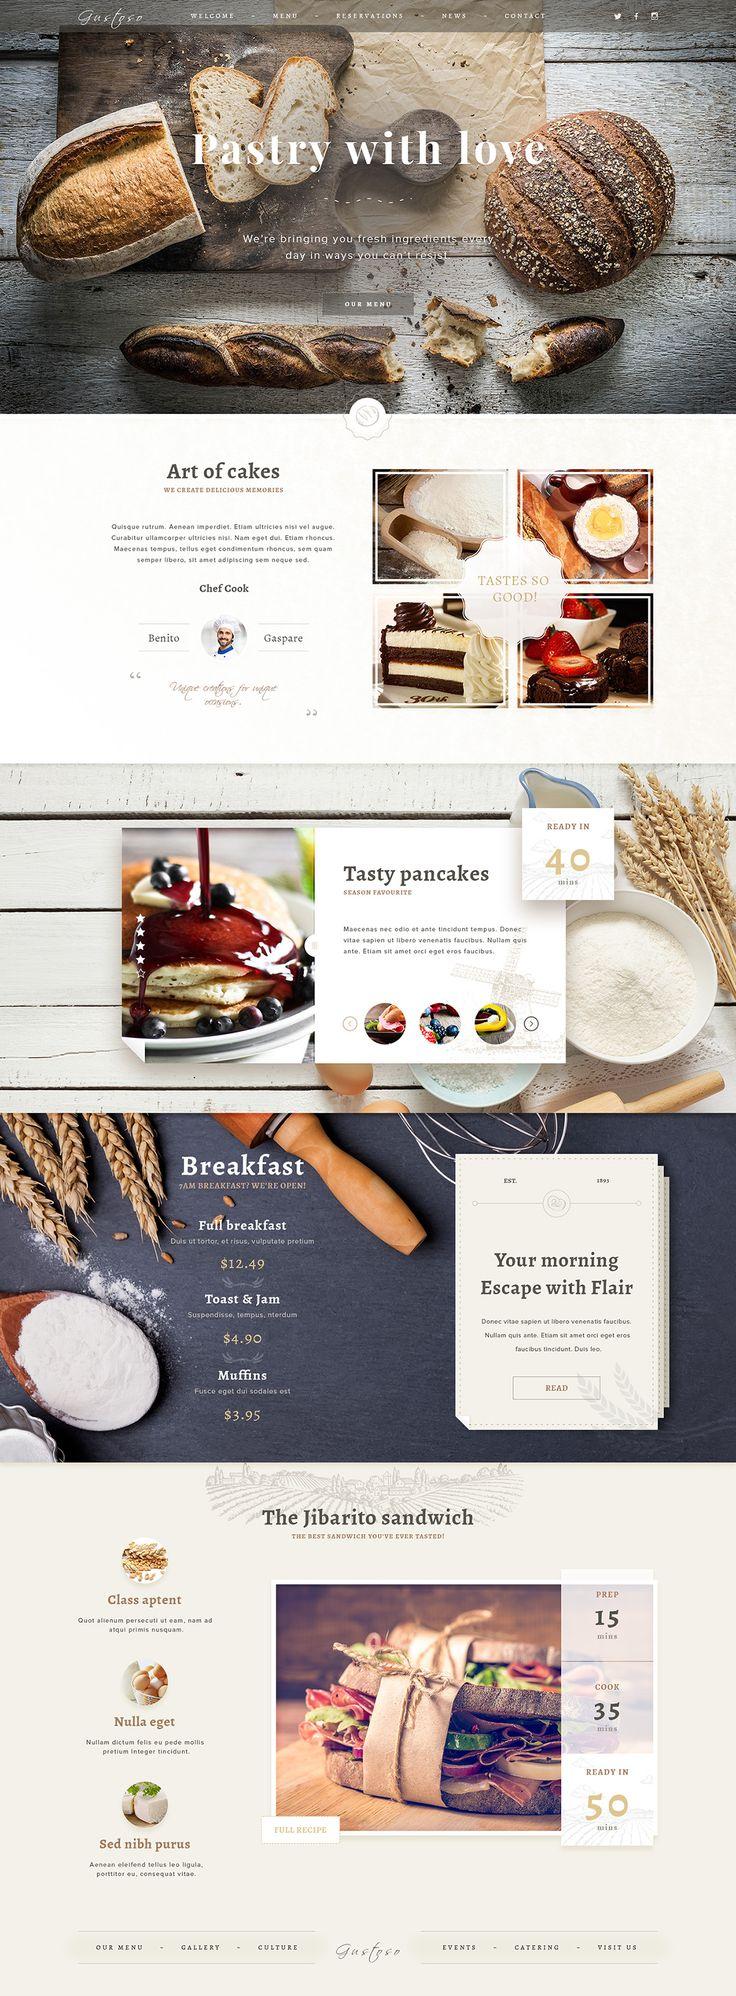 152 best Max Media Pixels images on Pinterest | Web layout, Website ...